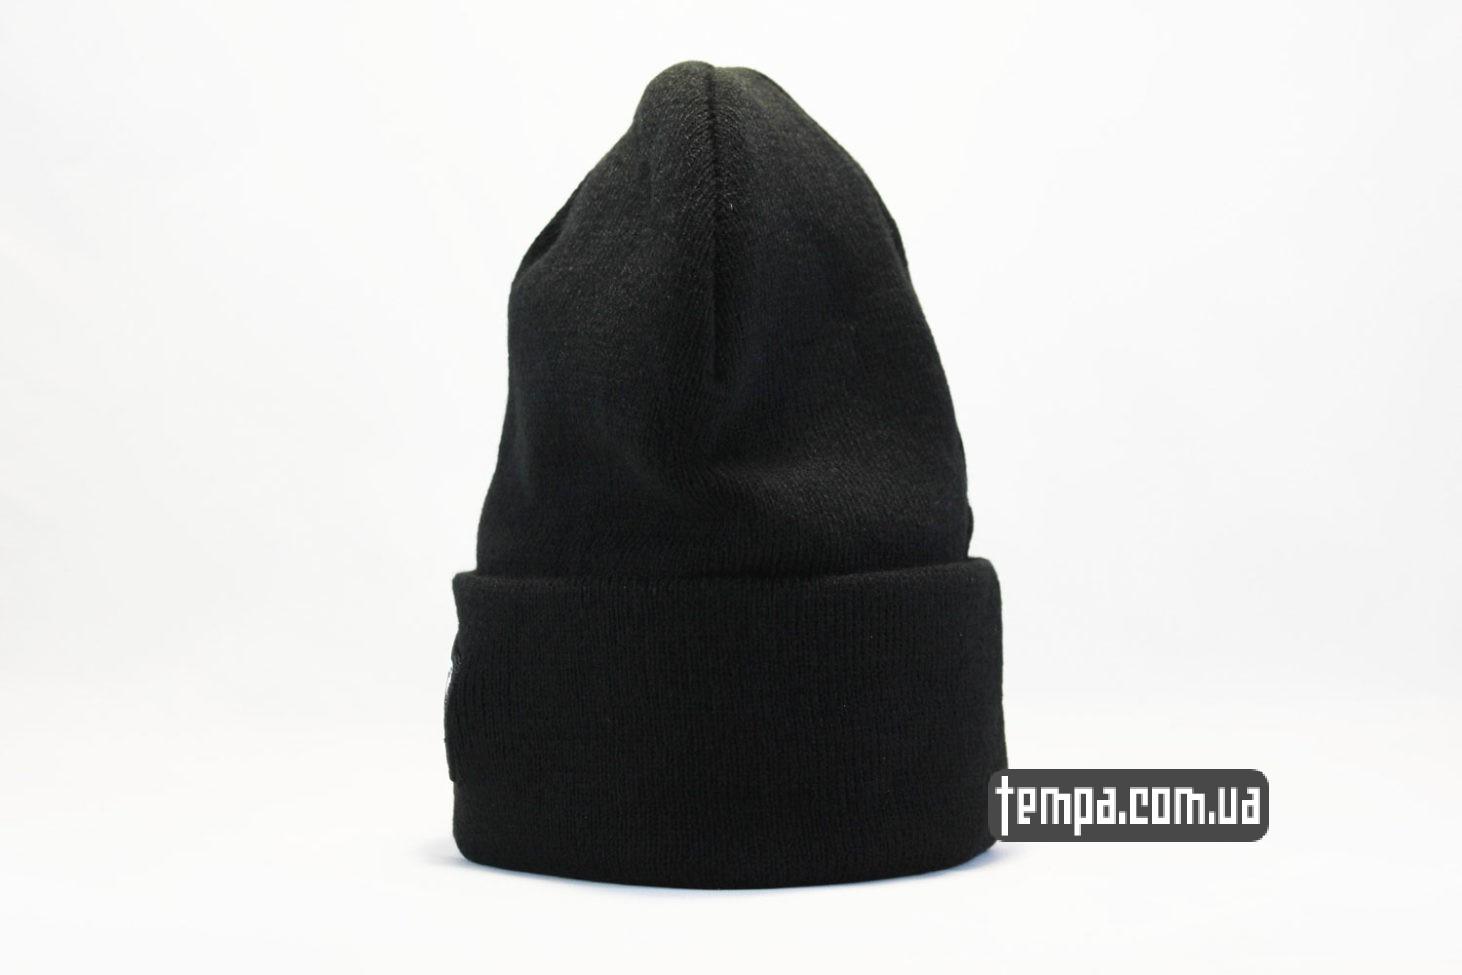 чисто черная шапка бини VANS ВЭНС off the wall black черная